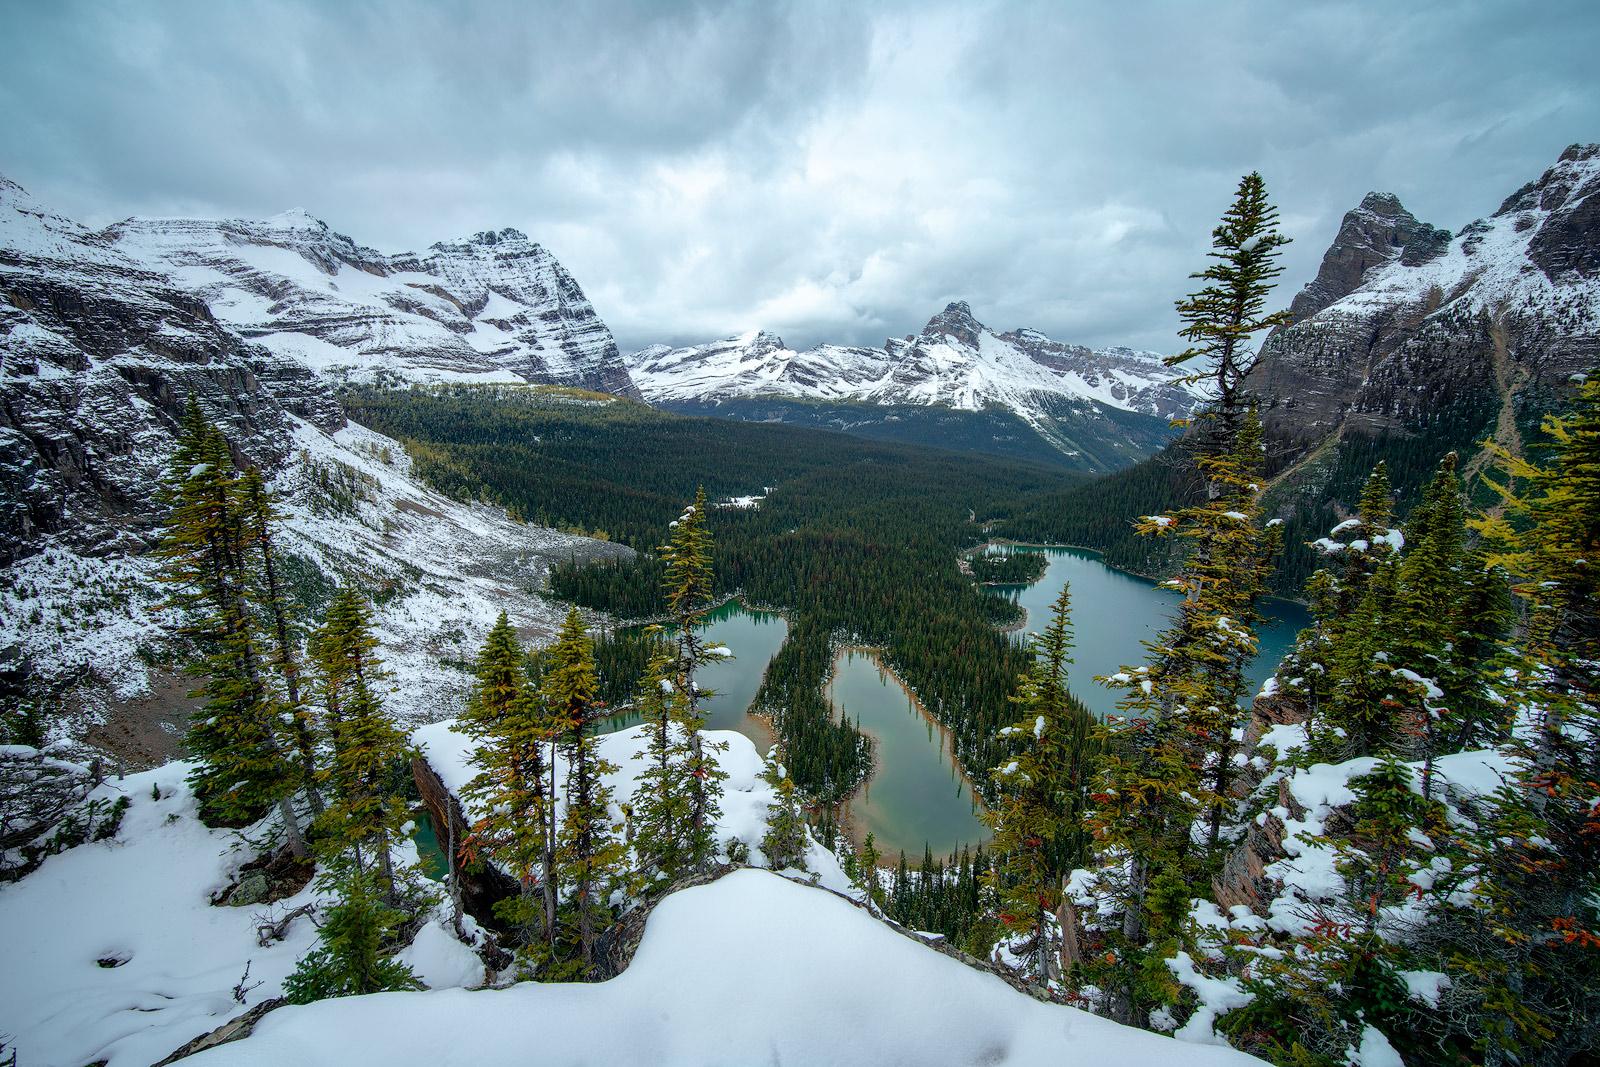 Canada, Glacier, Alberta, Banff, Moraine Lake, Canadian Rockies, Lake Louise, Jasper National Park, Rocky Mountains, Lake Minnewanka...